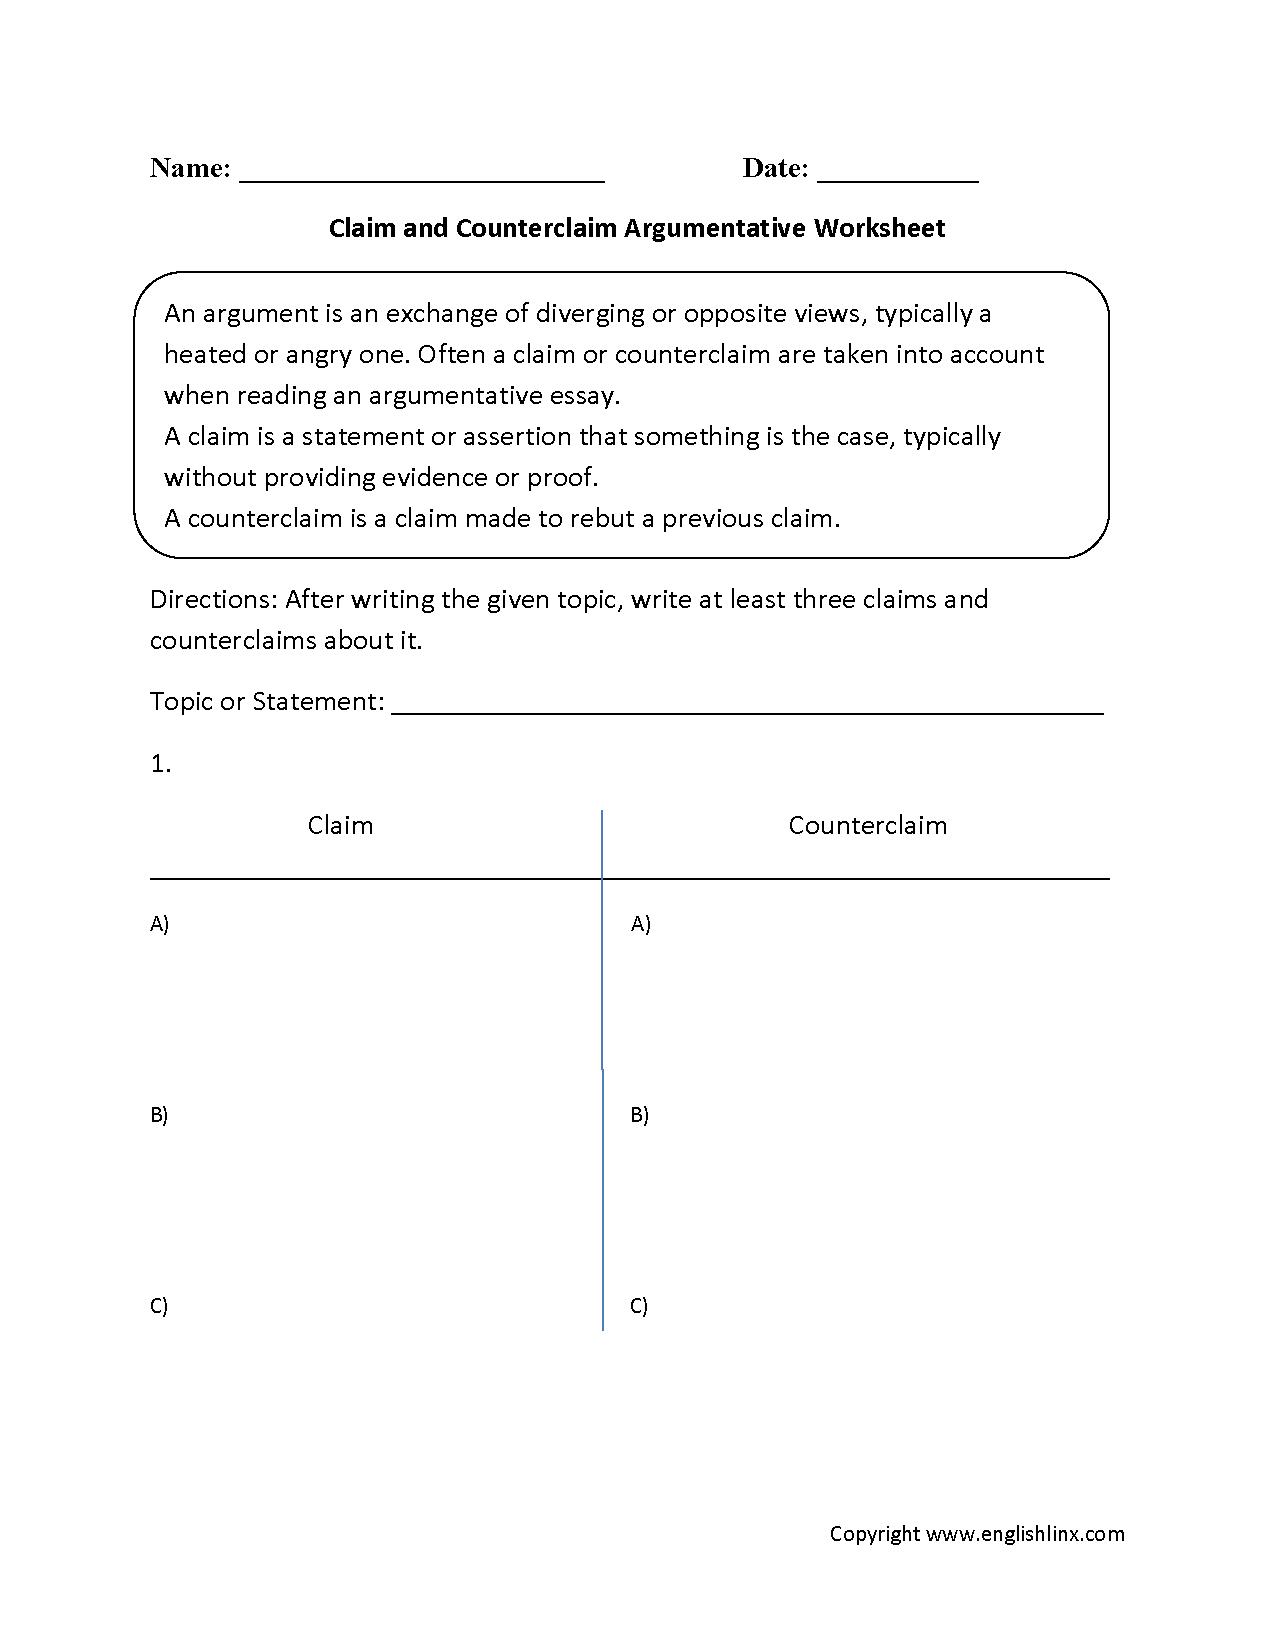 Claim Counterclaim Rebuttal Worksheet Db Excel